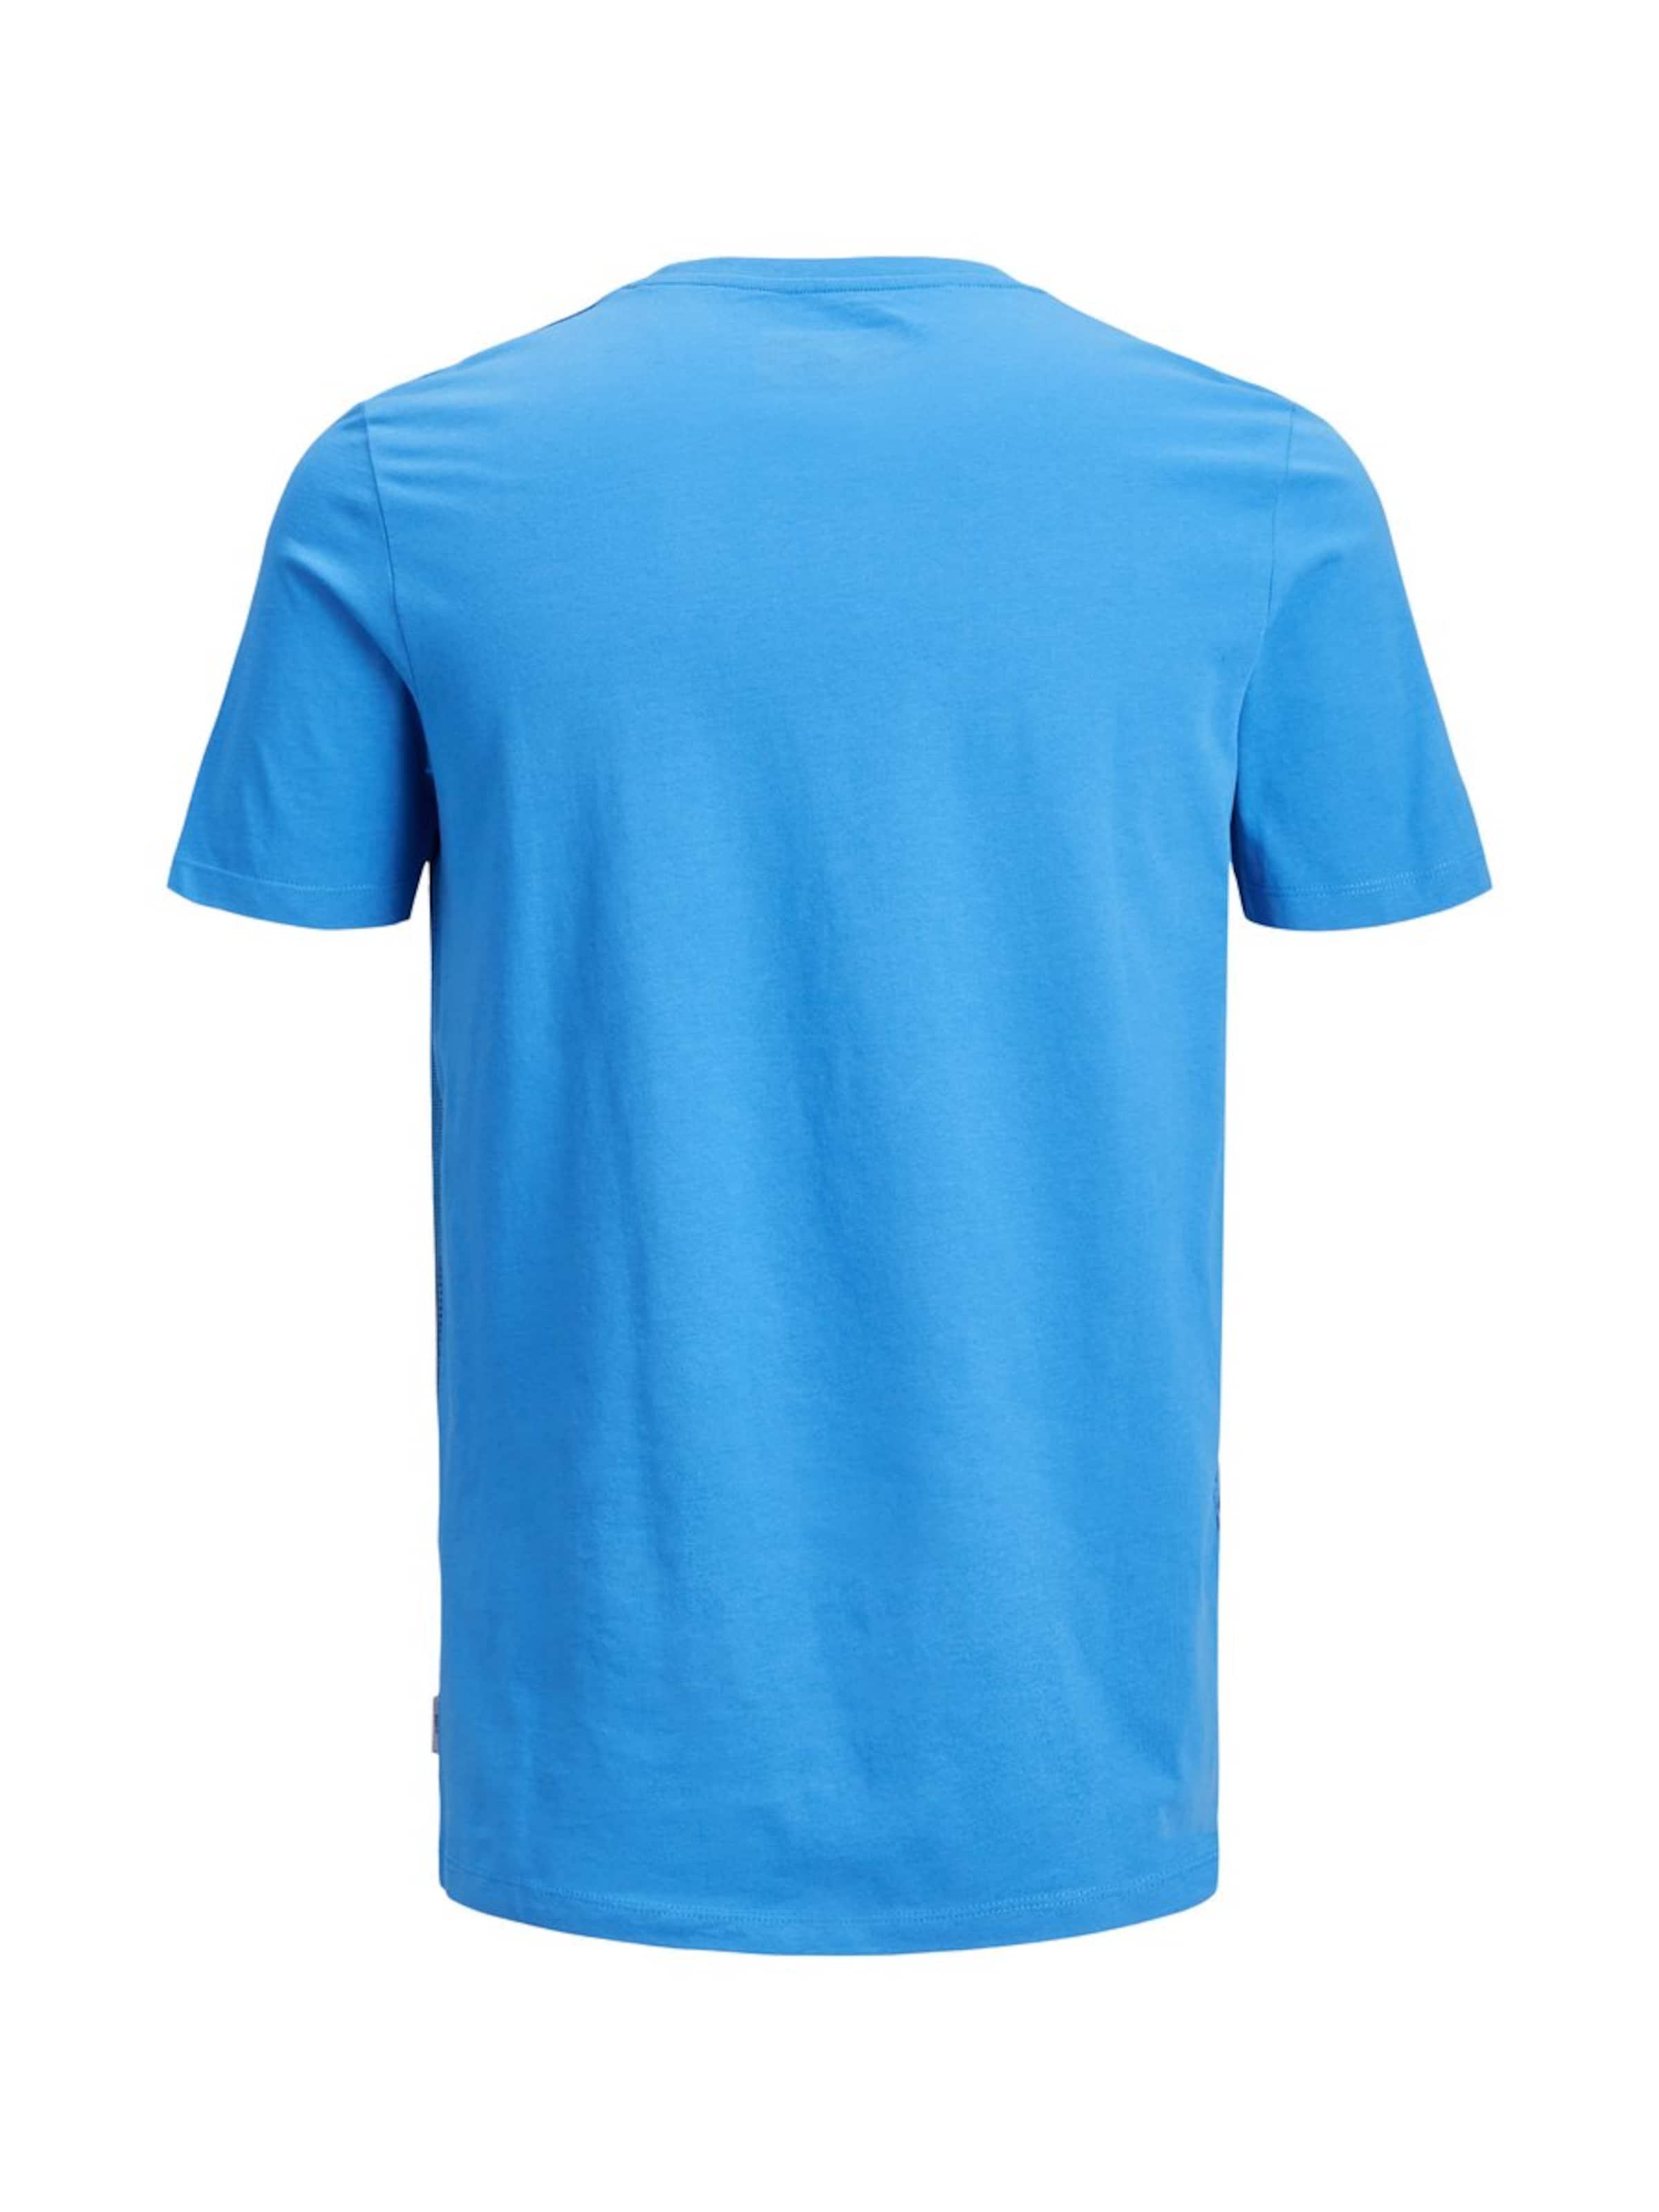 T In Jones Weiß RoyalblauSchwarz Jackamp; shirt SUpVzM